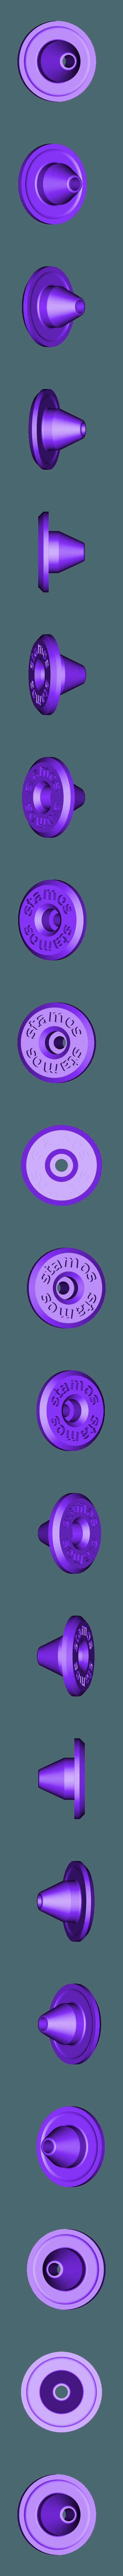 Plug_stamos_32mm.stl Download free STL file Bar-End bike Plugs • Object to 3D print, Stamos